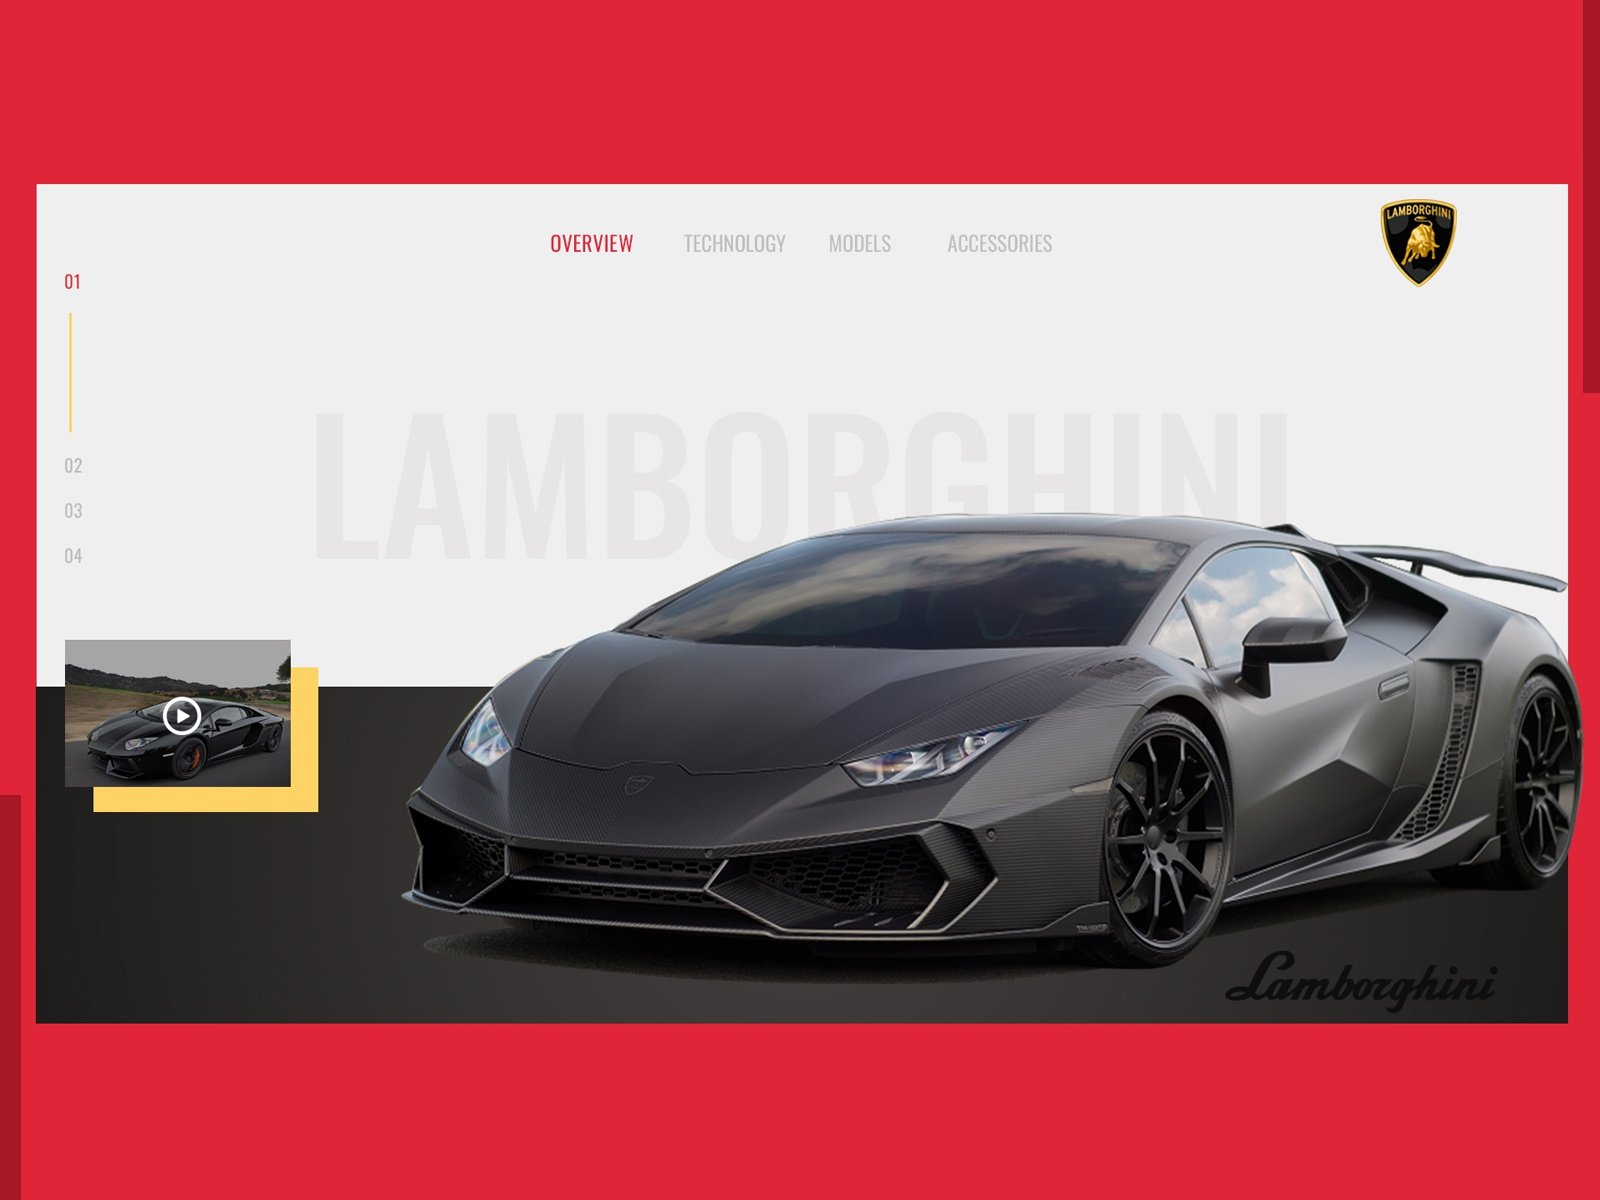 Lamborghini copy